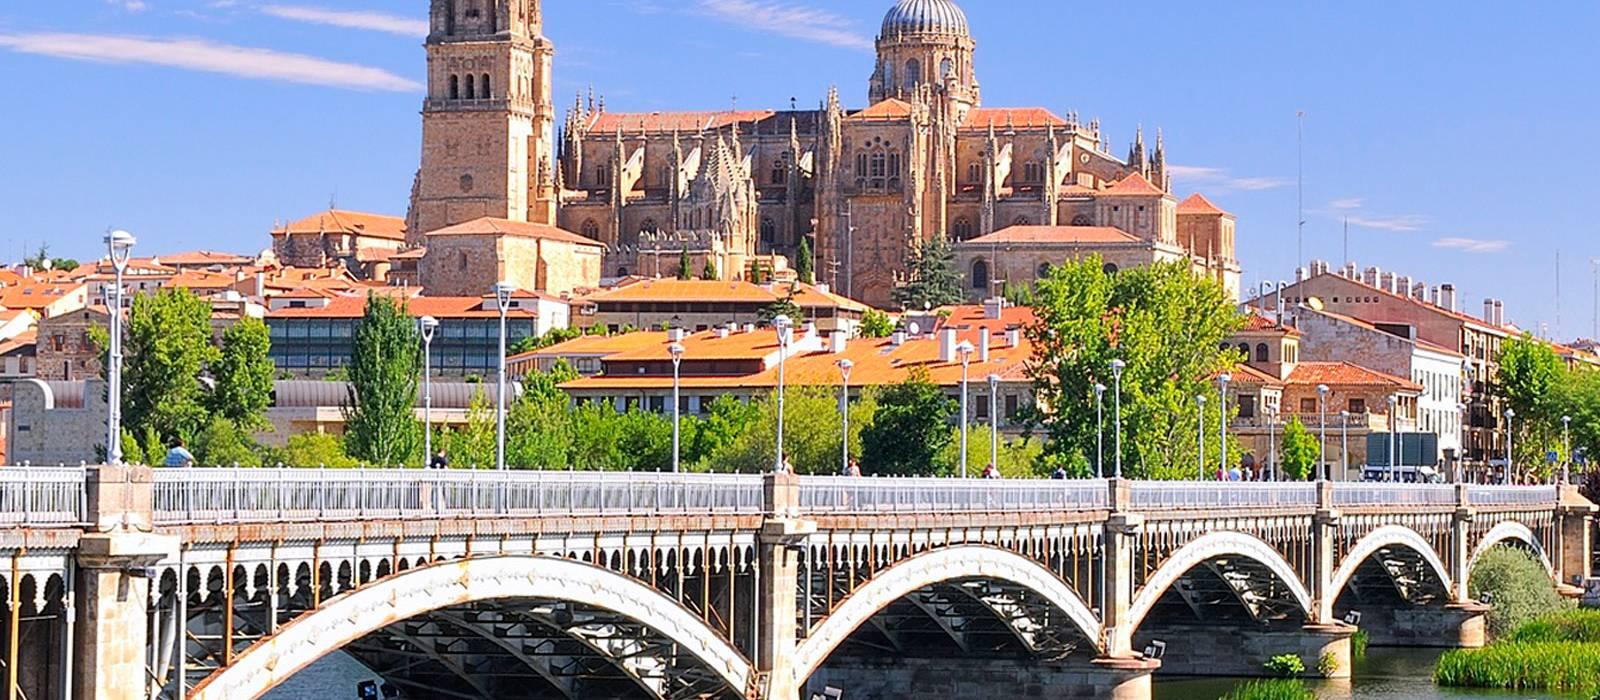 Promo Antizipieren und in Salamanca zu retten - Vincci Hoteles